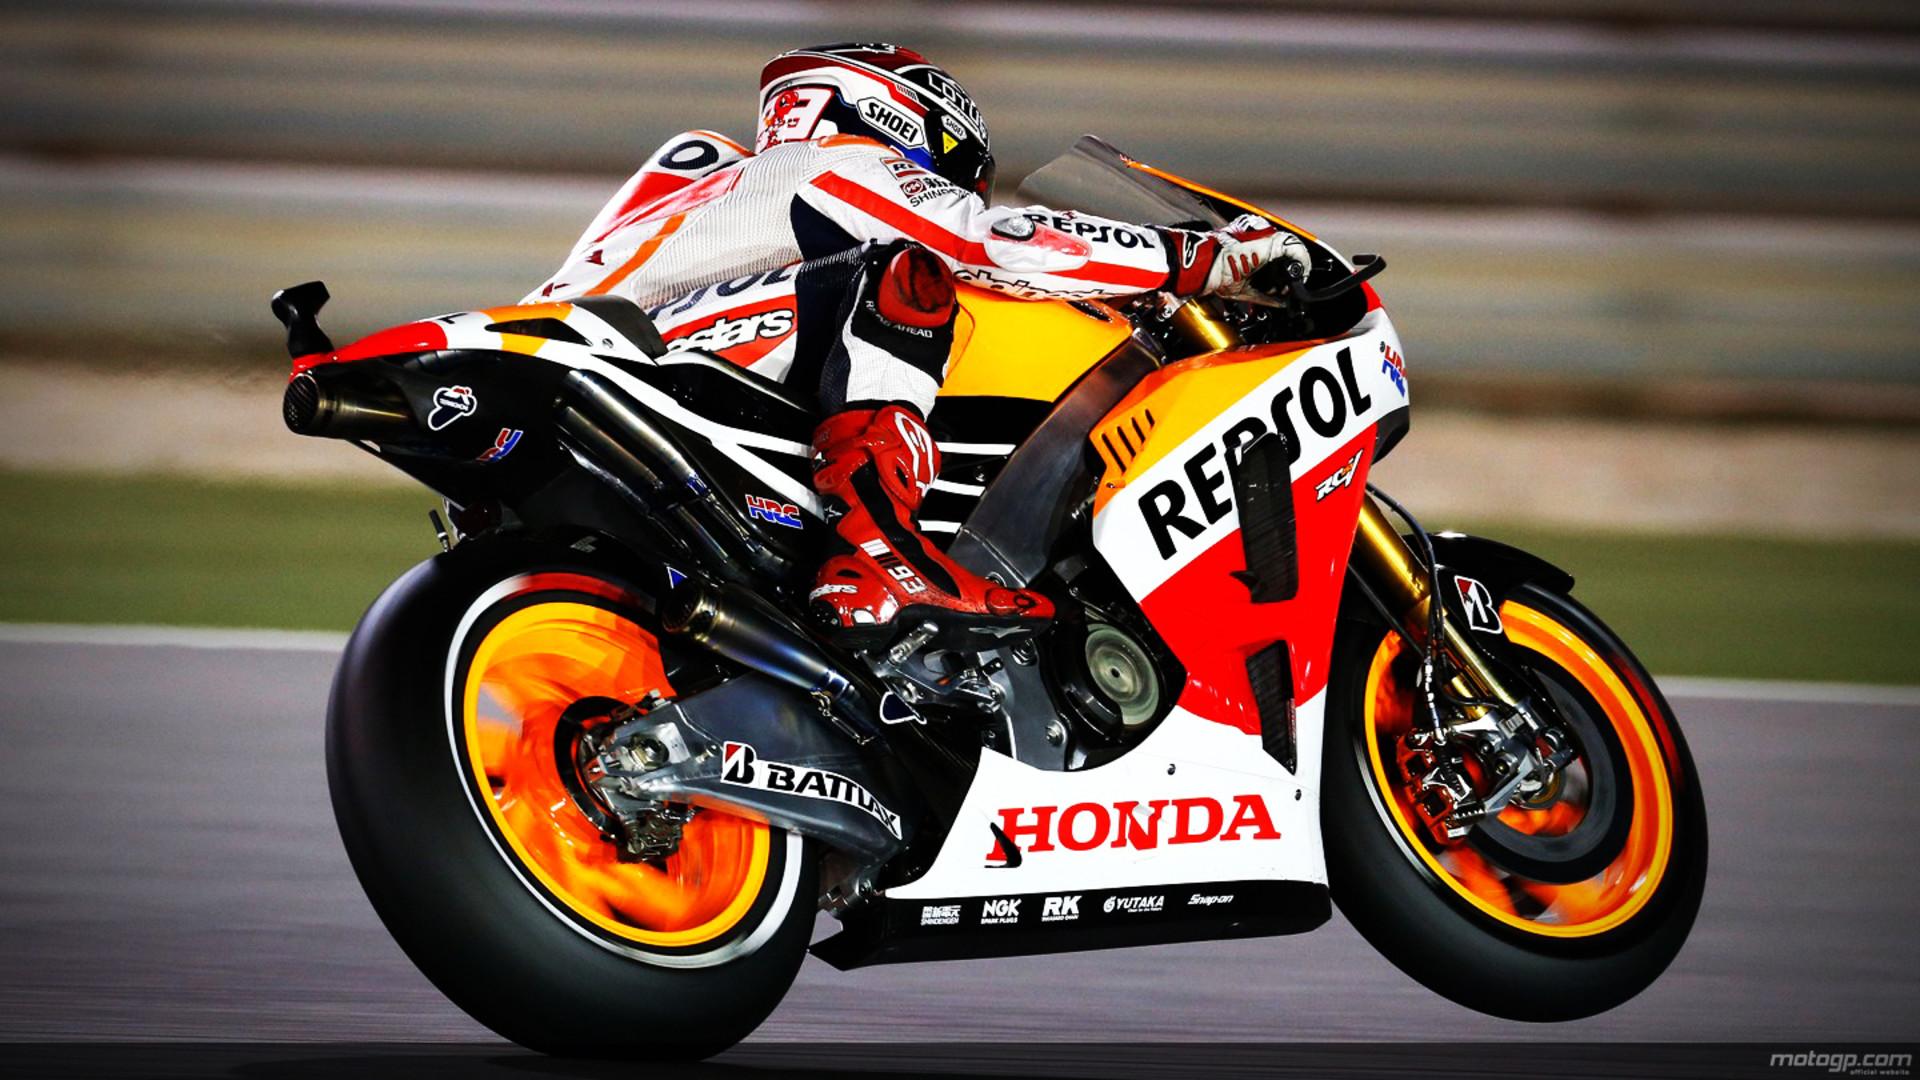 Sports-moto-gp-marc-marquez-2014-wallpaper.jpg (